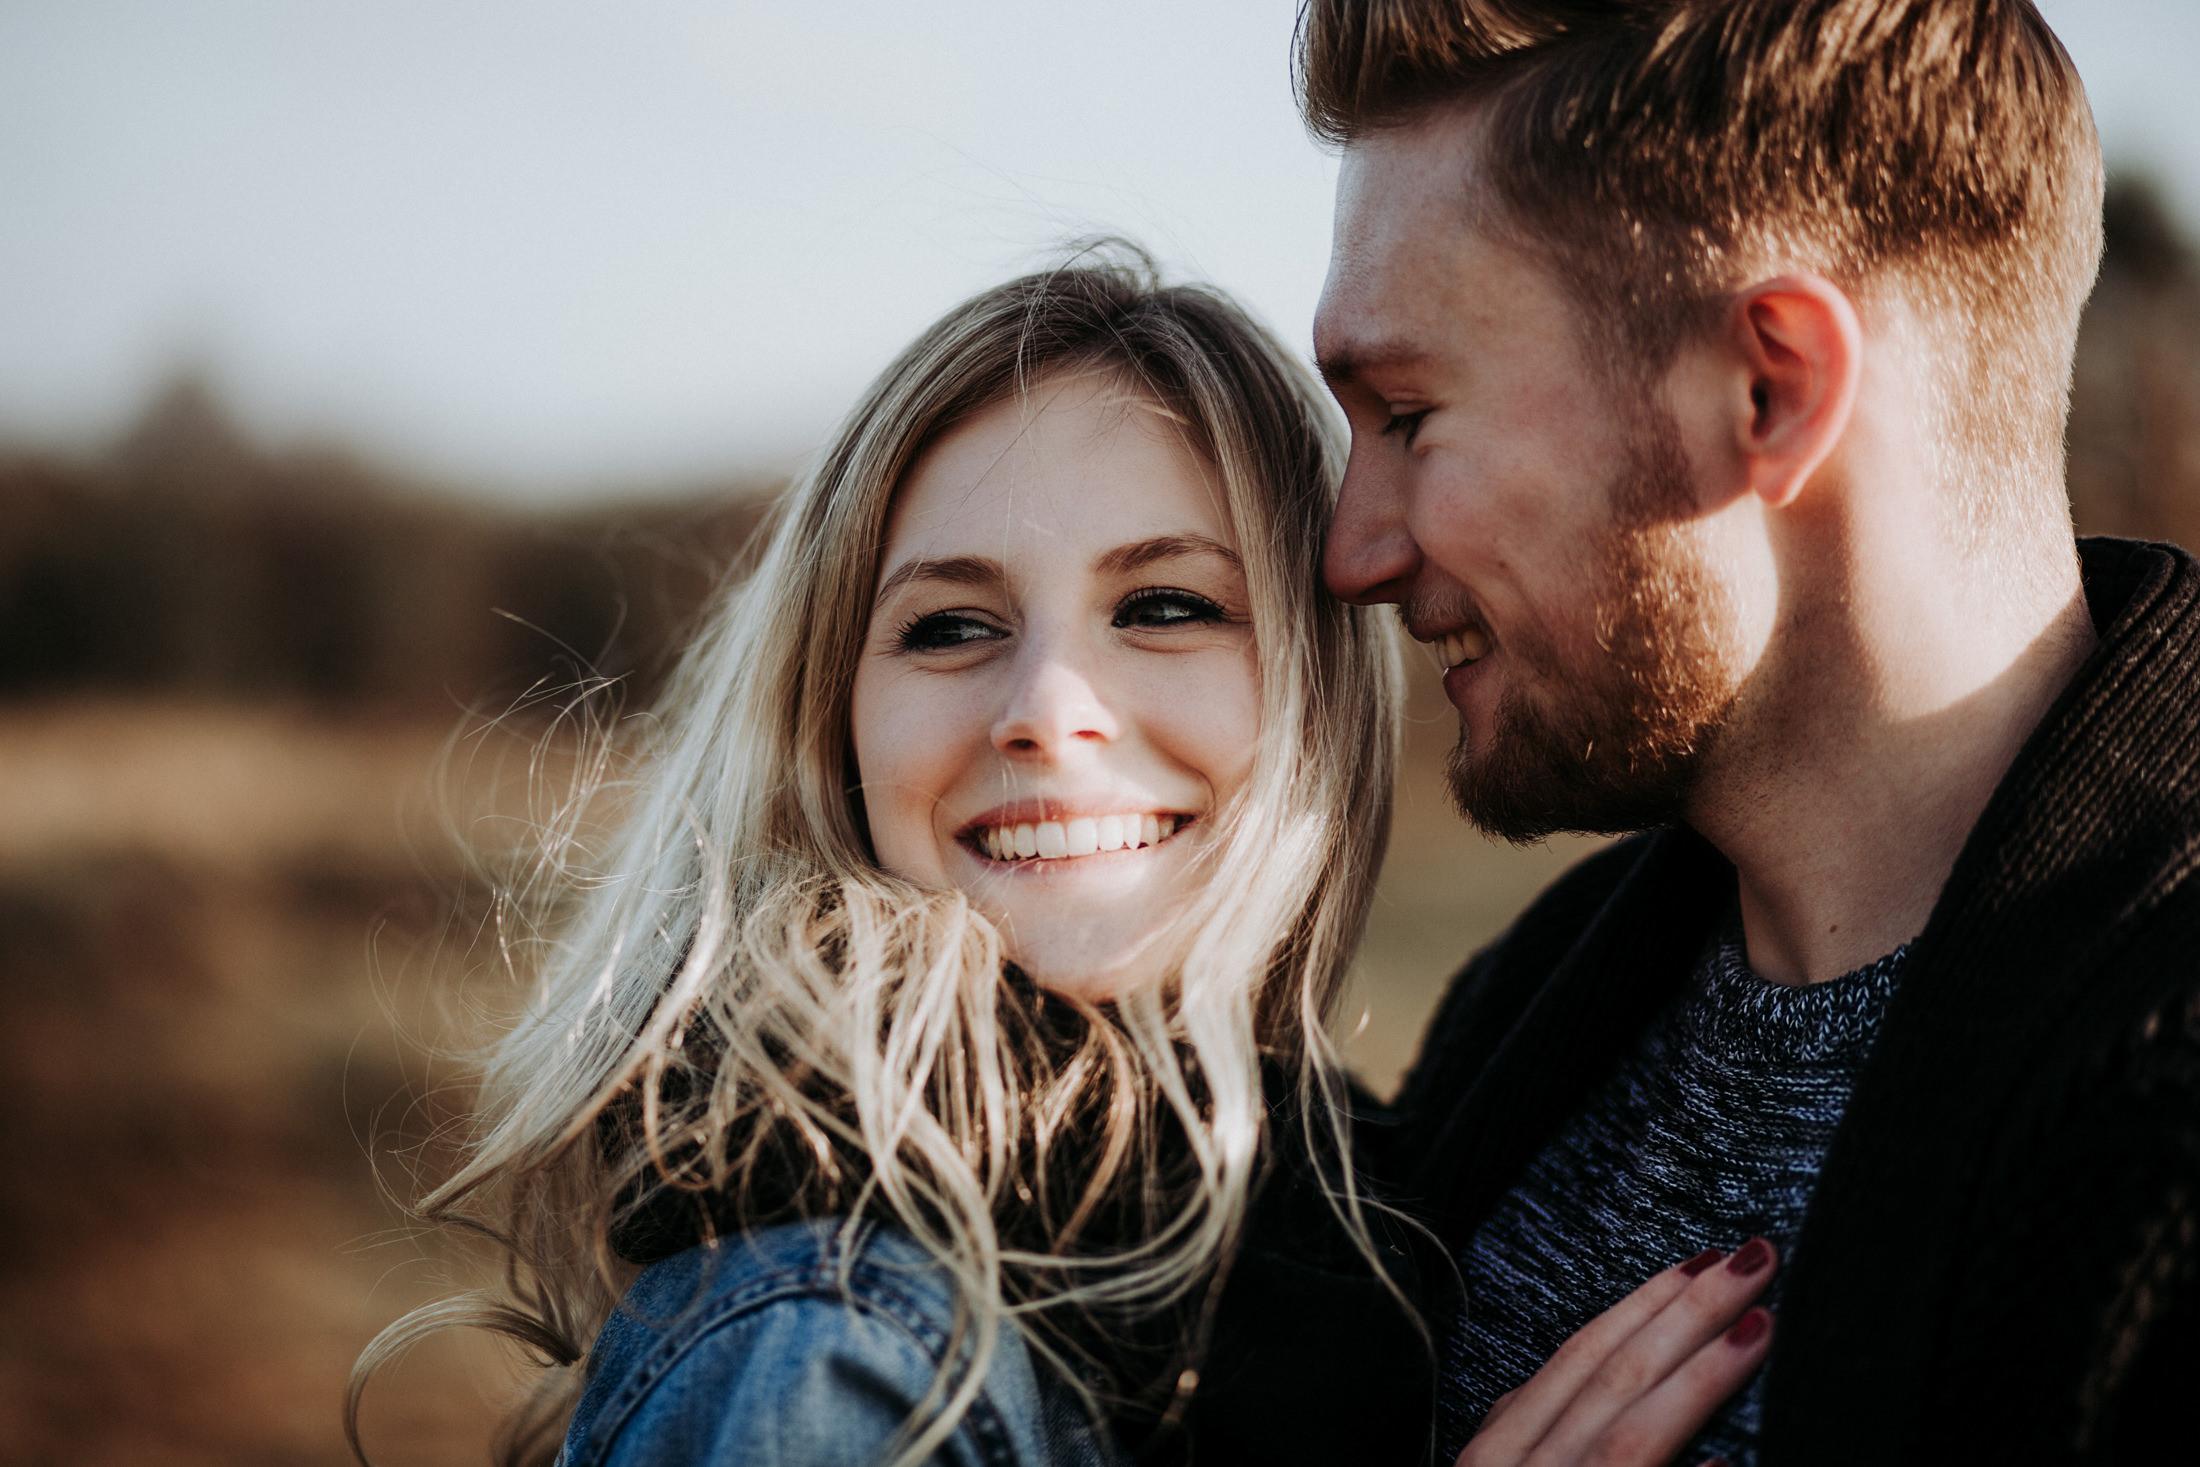 Wedding_Photographer_Mallorca_Daniela-Marquardt_Photography_CanaryIslands_Lanzarote_Iceland_Tuskany_Santorini_Portugal__Austria_Elopement_Hochzeitsfotograf_Milena_Marvin_29